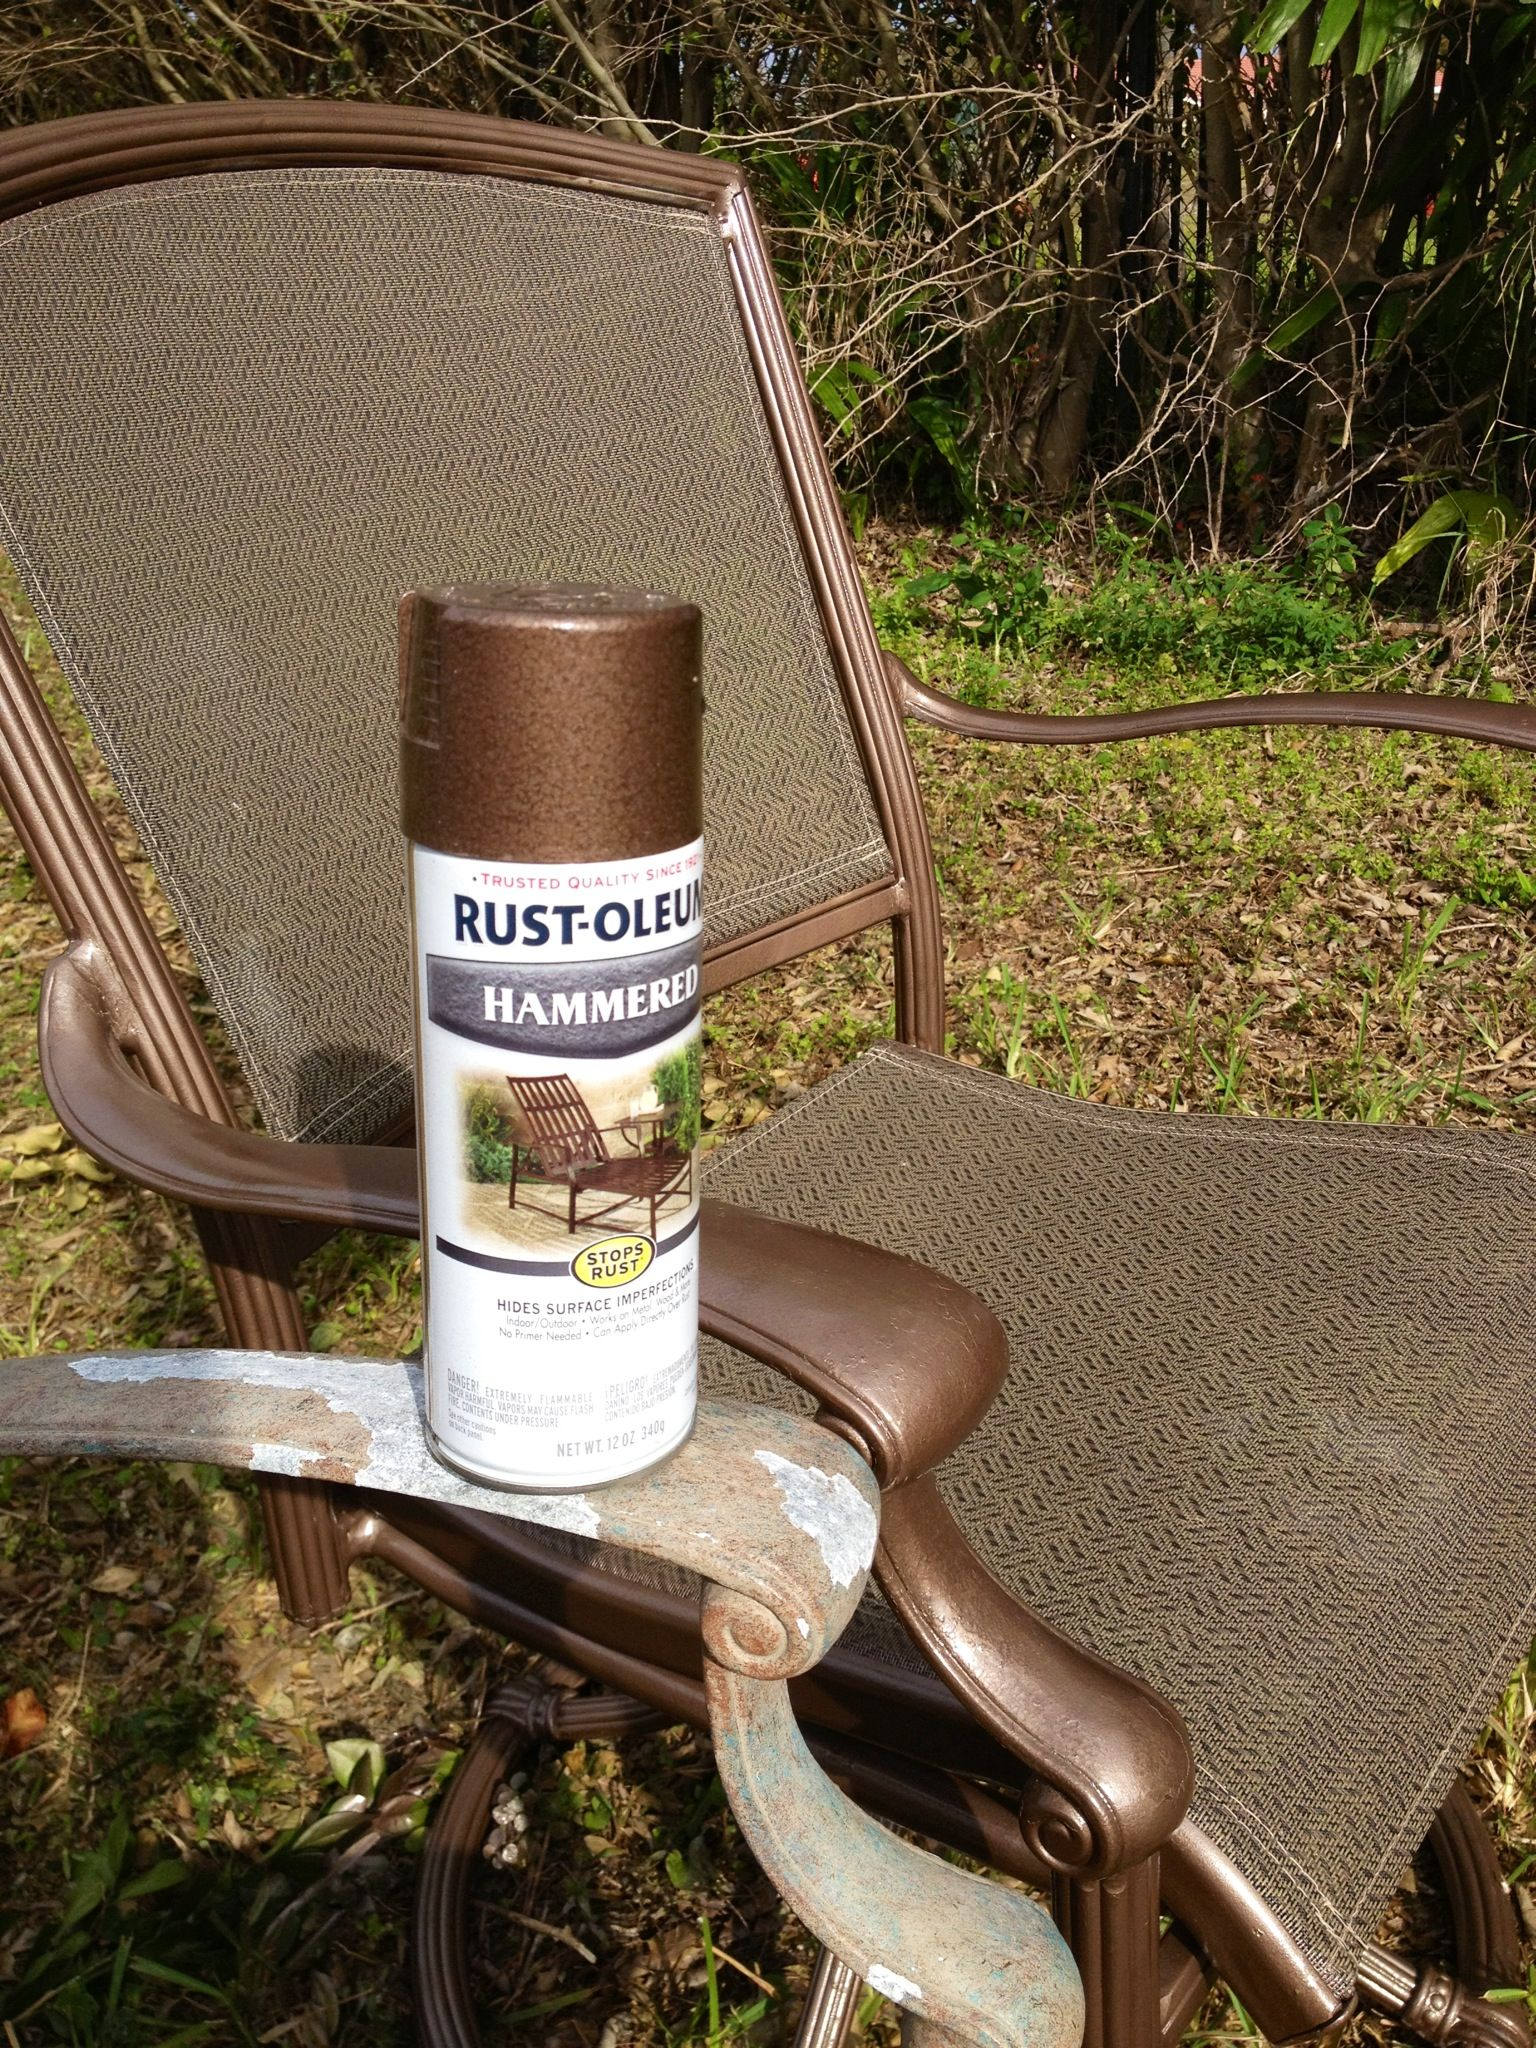 Rustoleum Hammered Metallic Spray Paint Upcycled